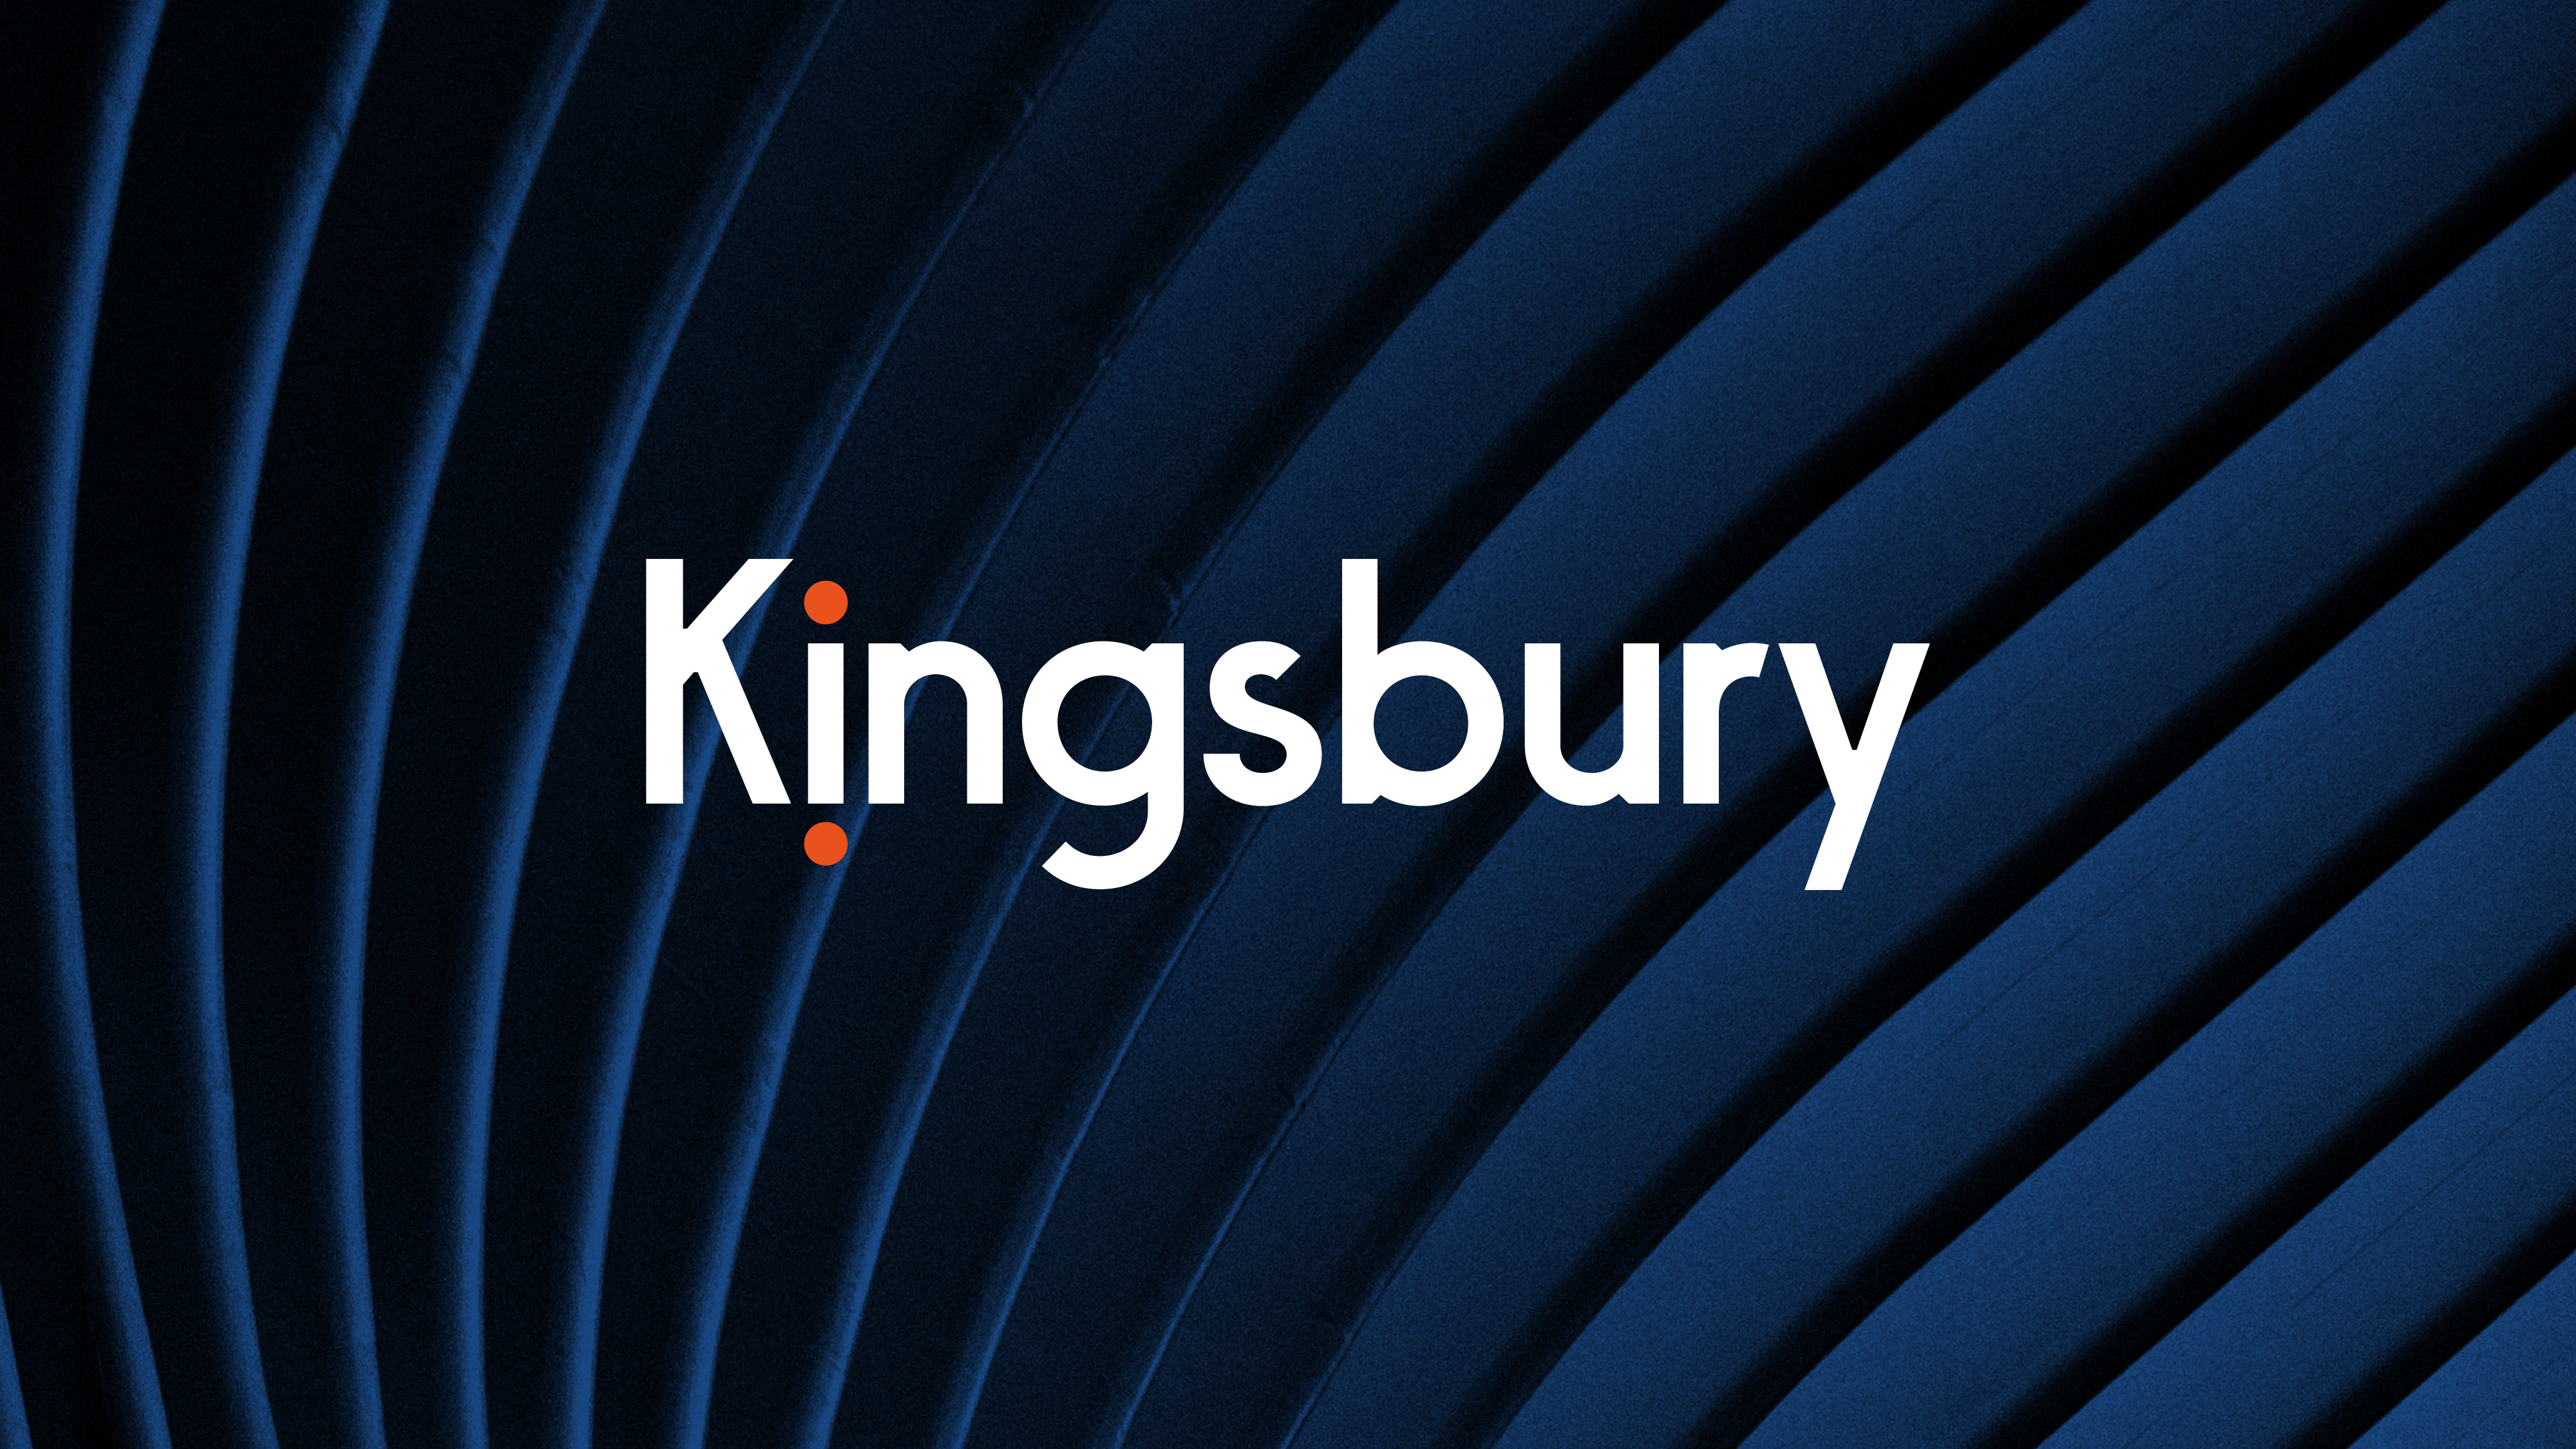 Kingsbury_Coburg_Teaser